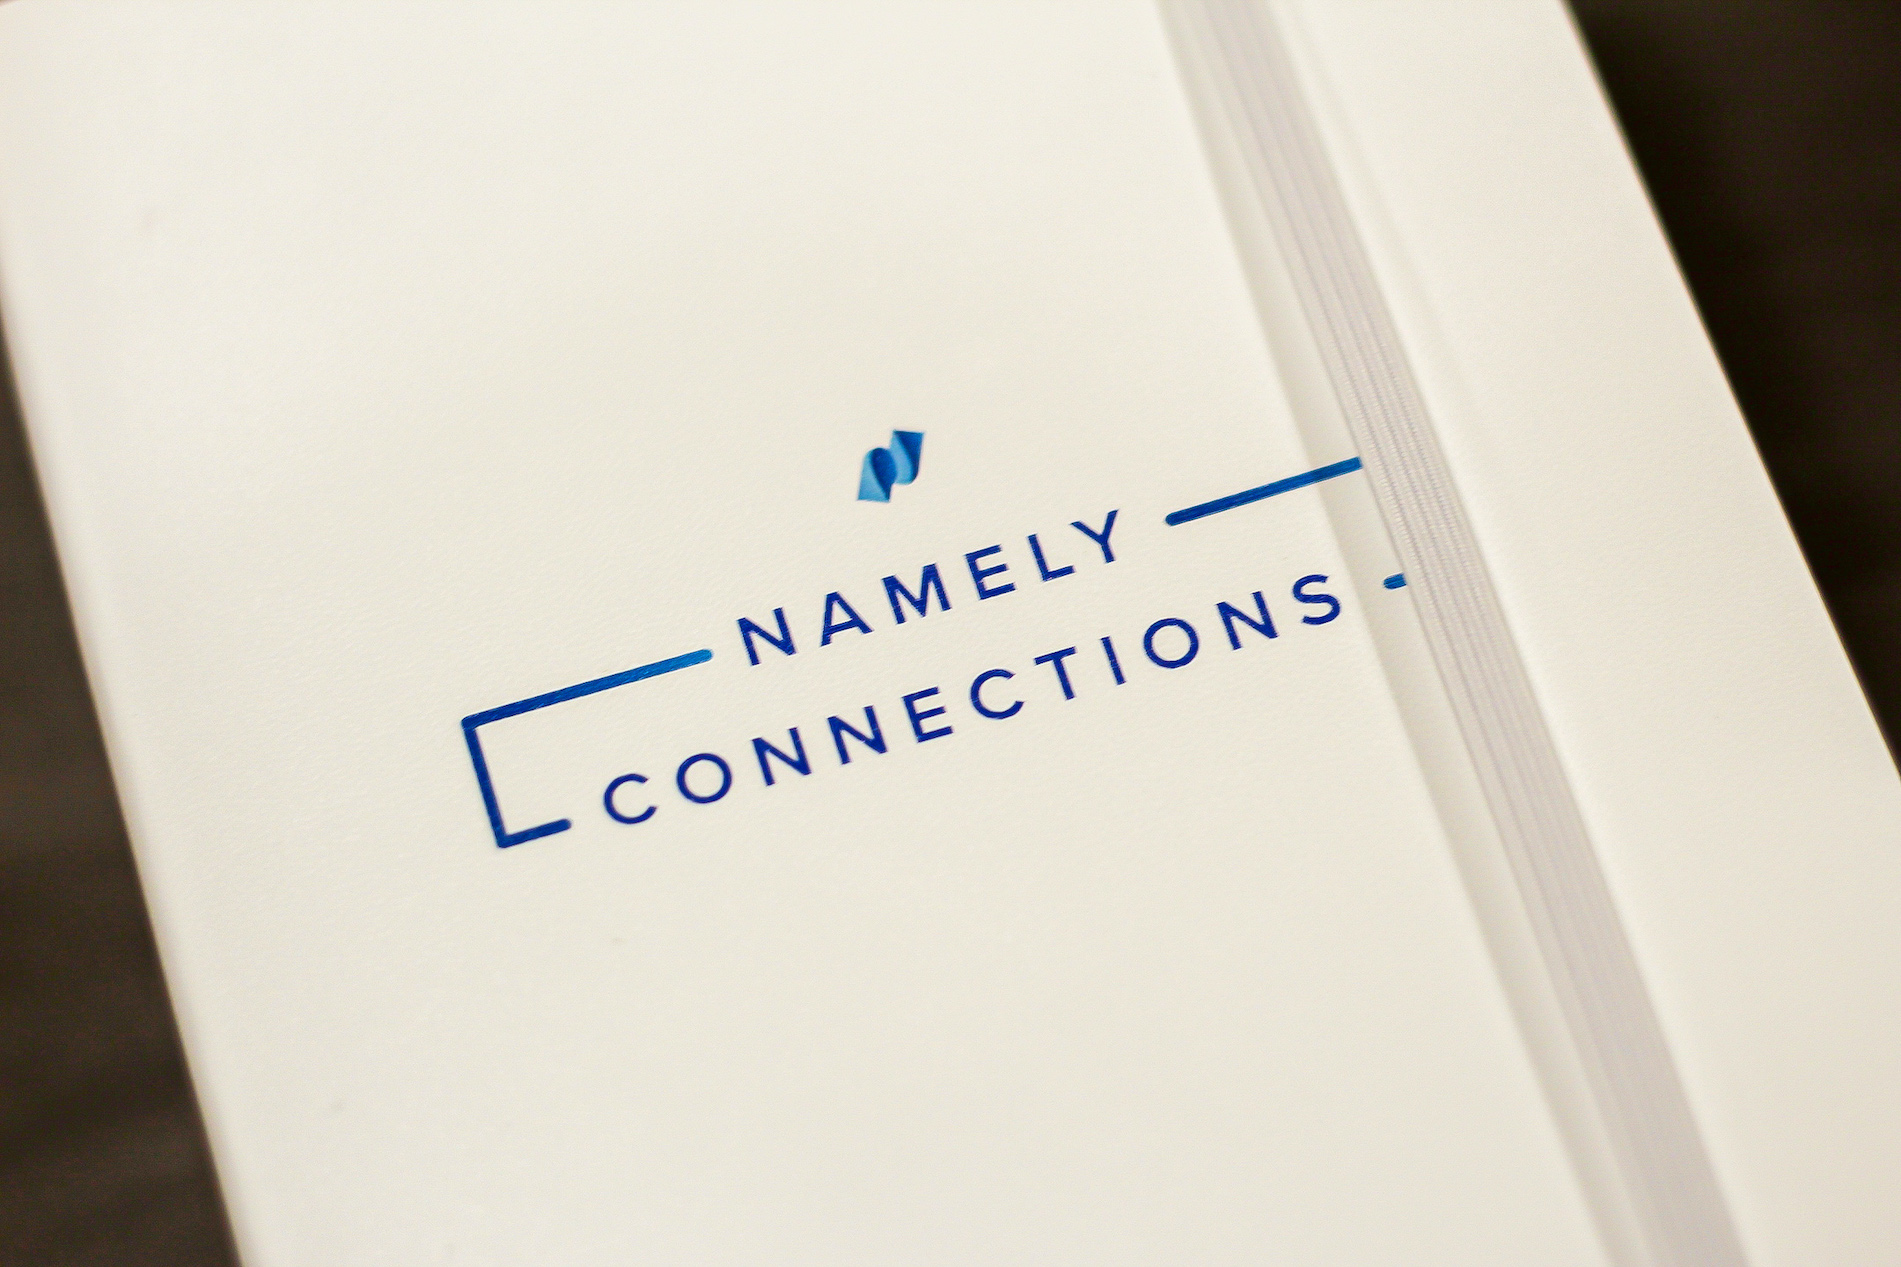 Namely Connections Client Spotlight Recap: Intellective